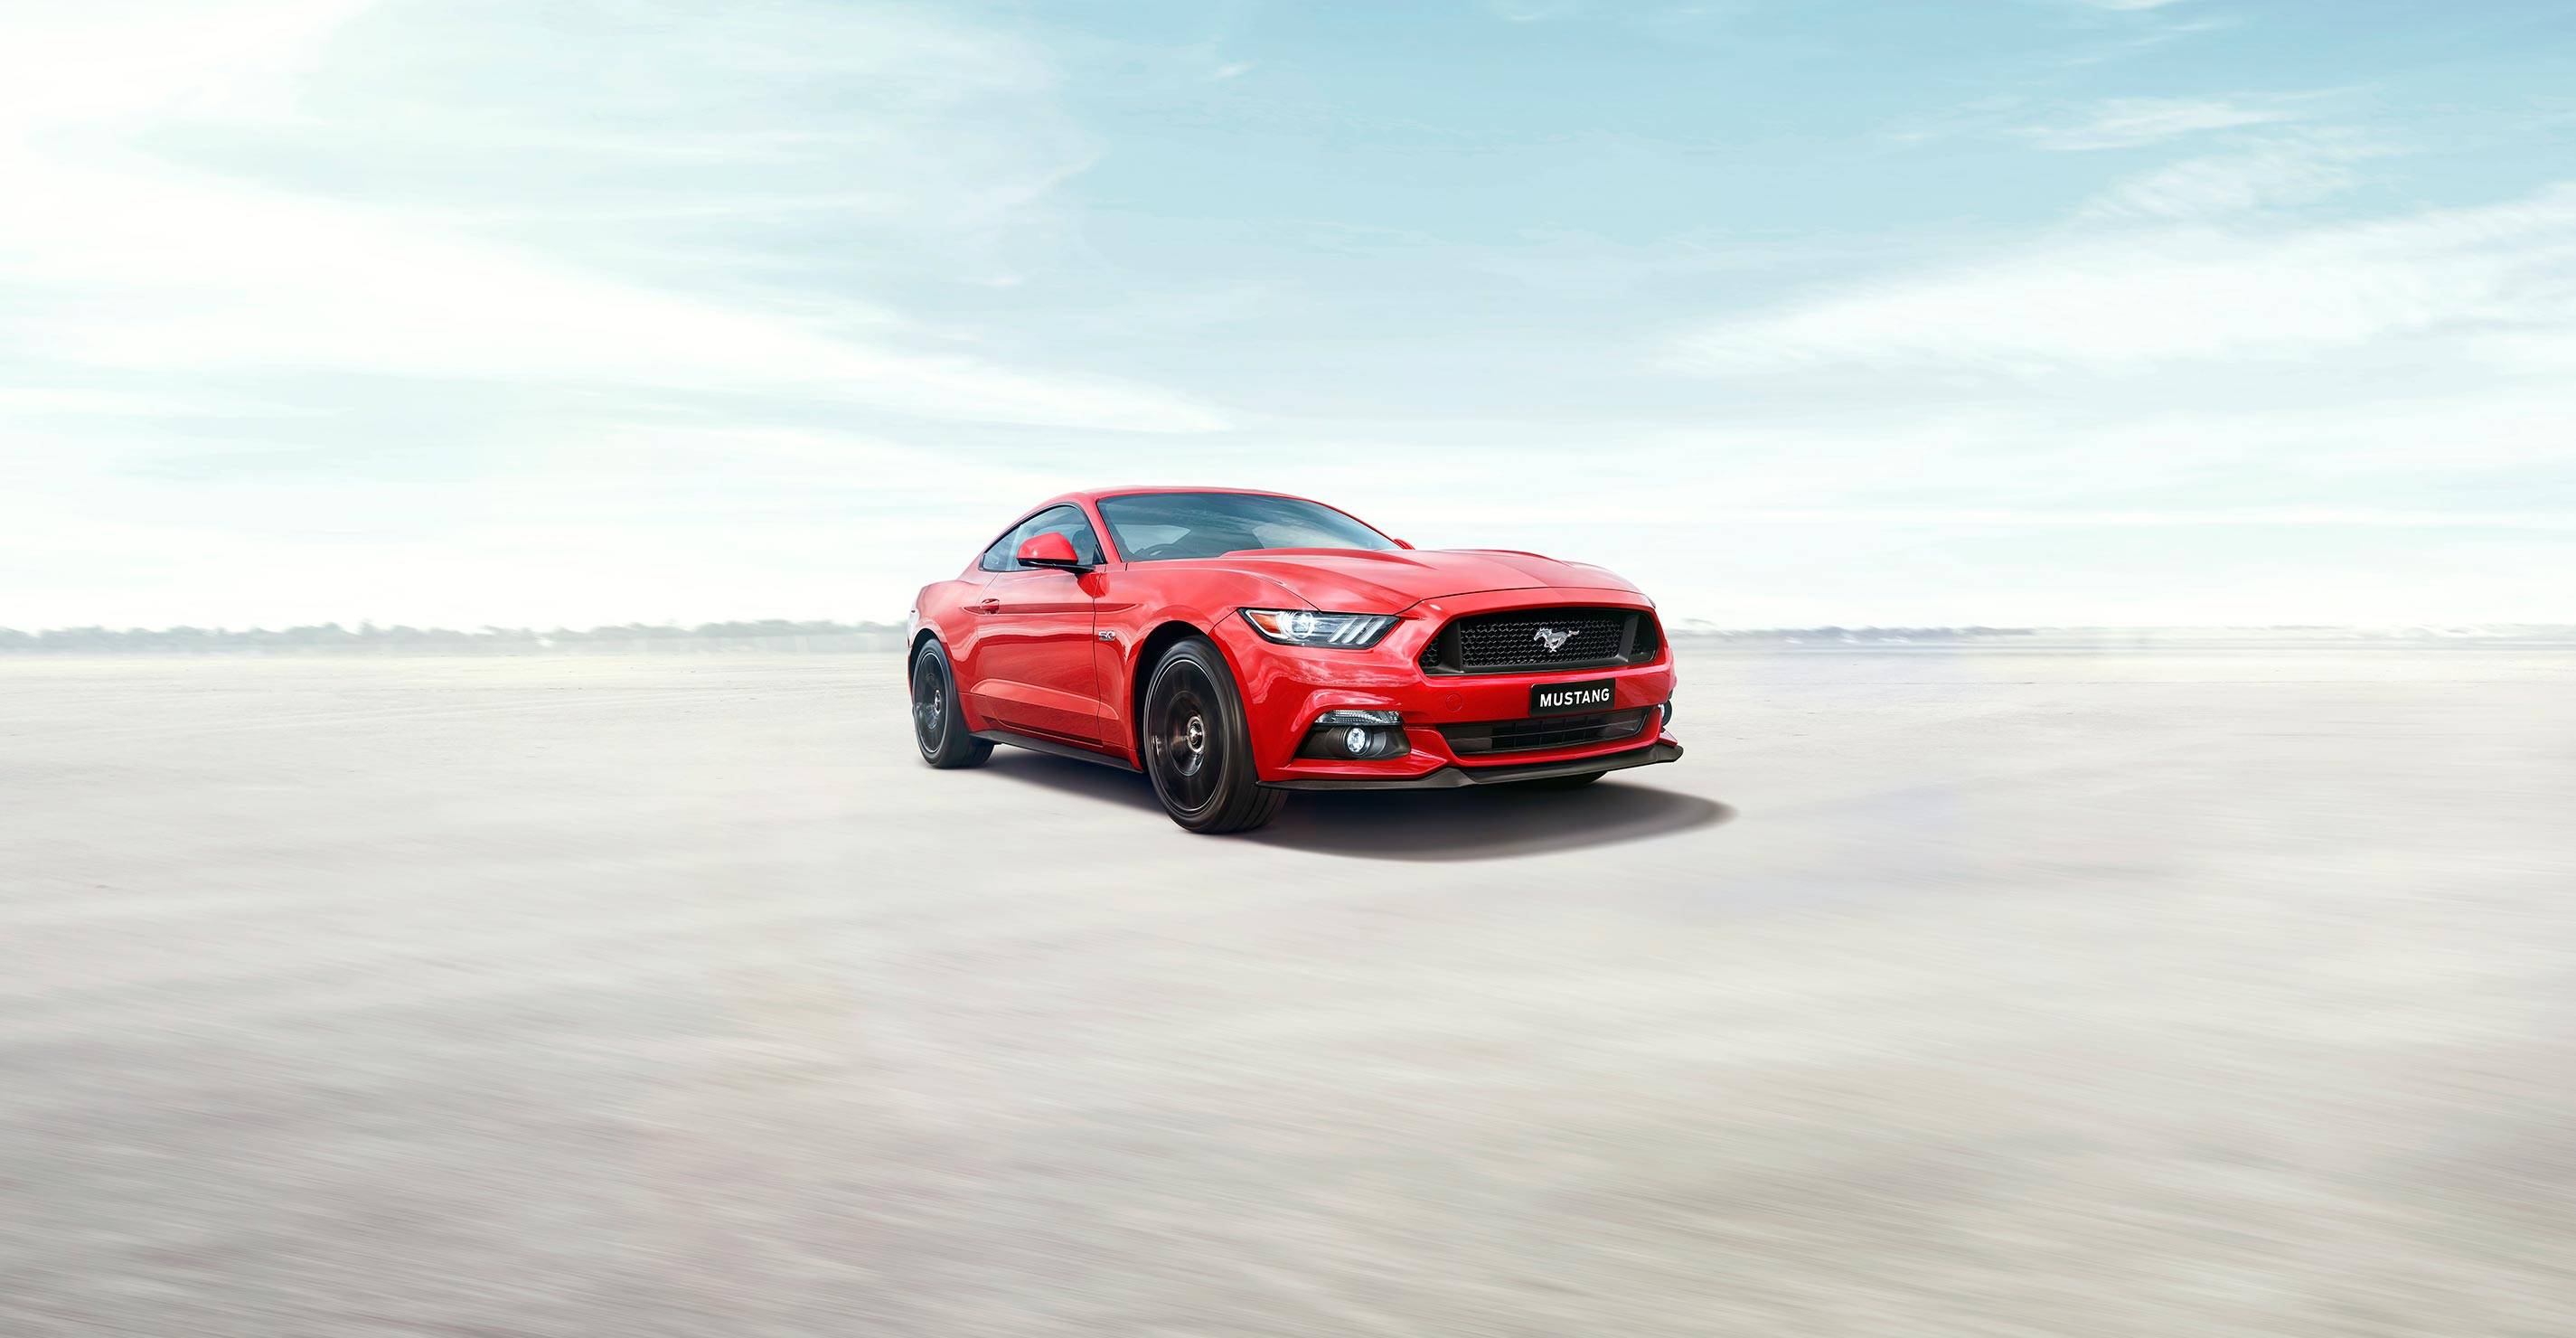 Mustang Main Image